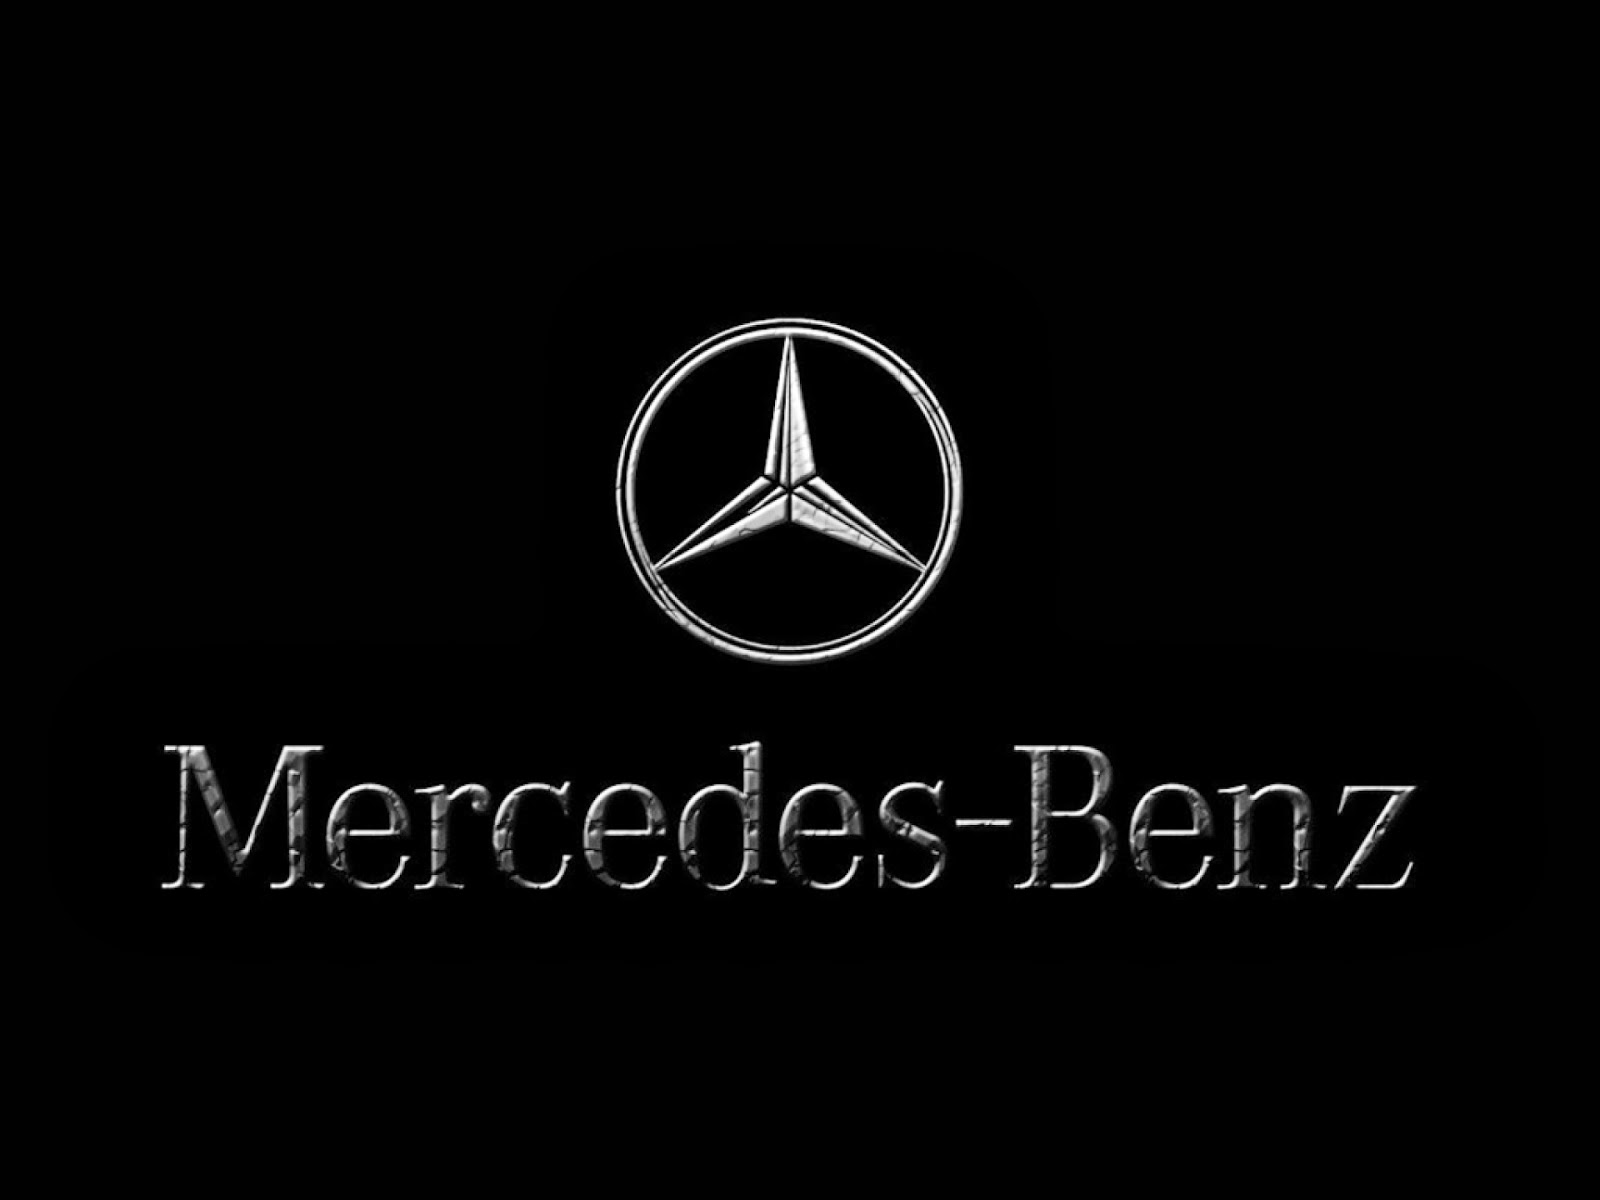 for Mercedes benz slogan